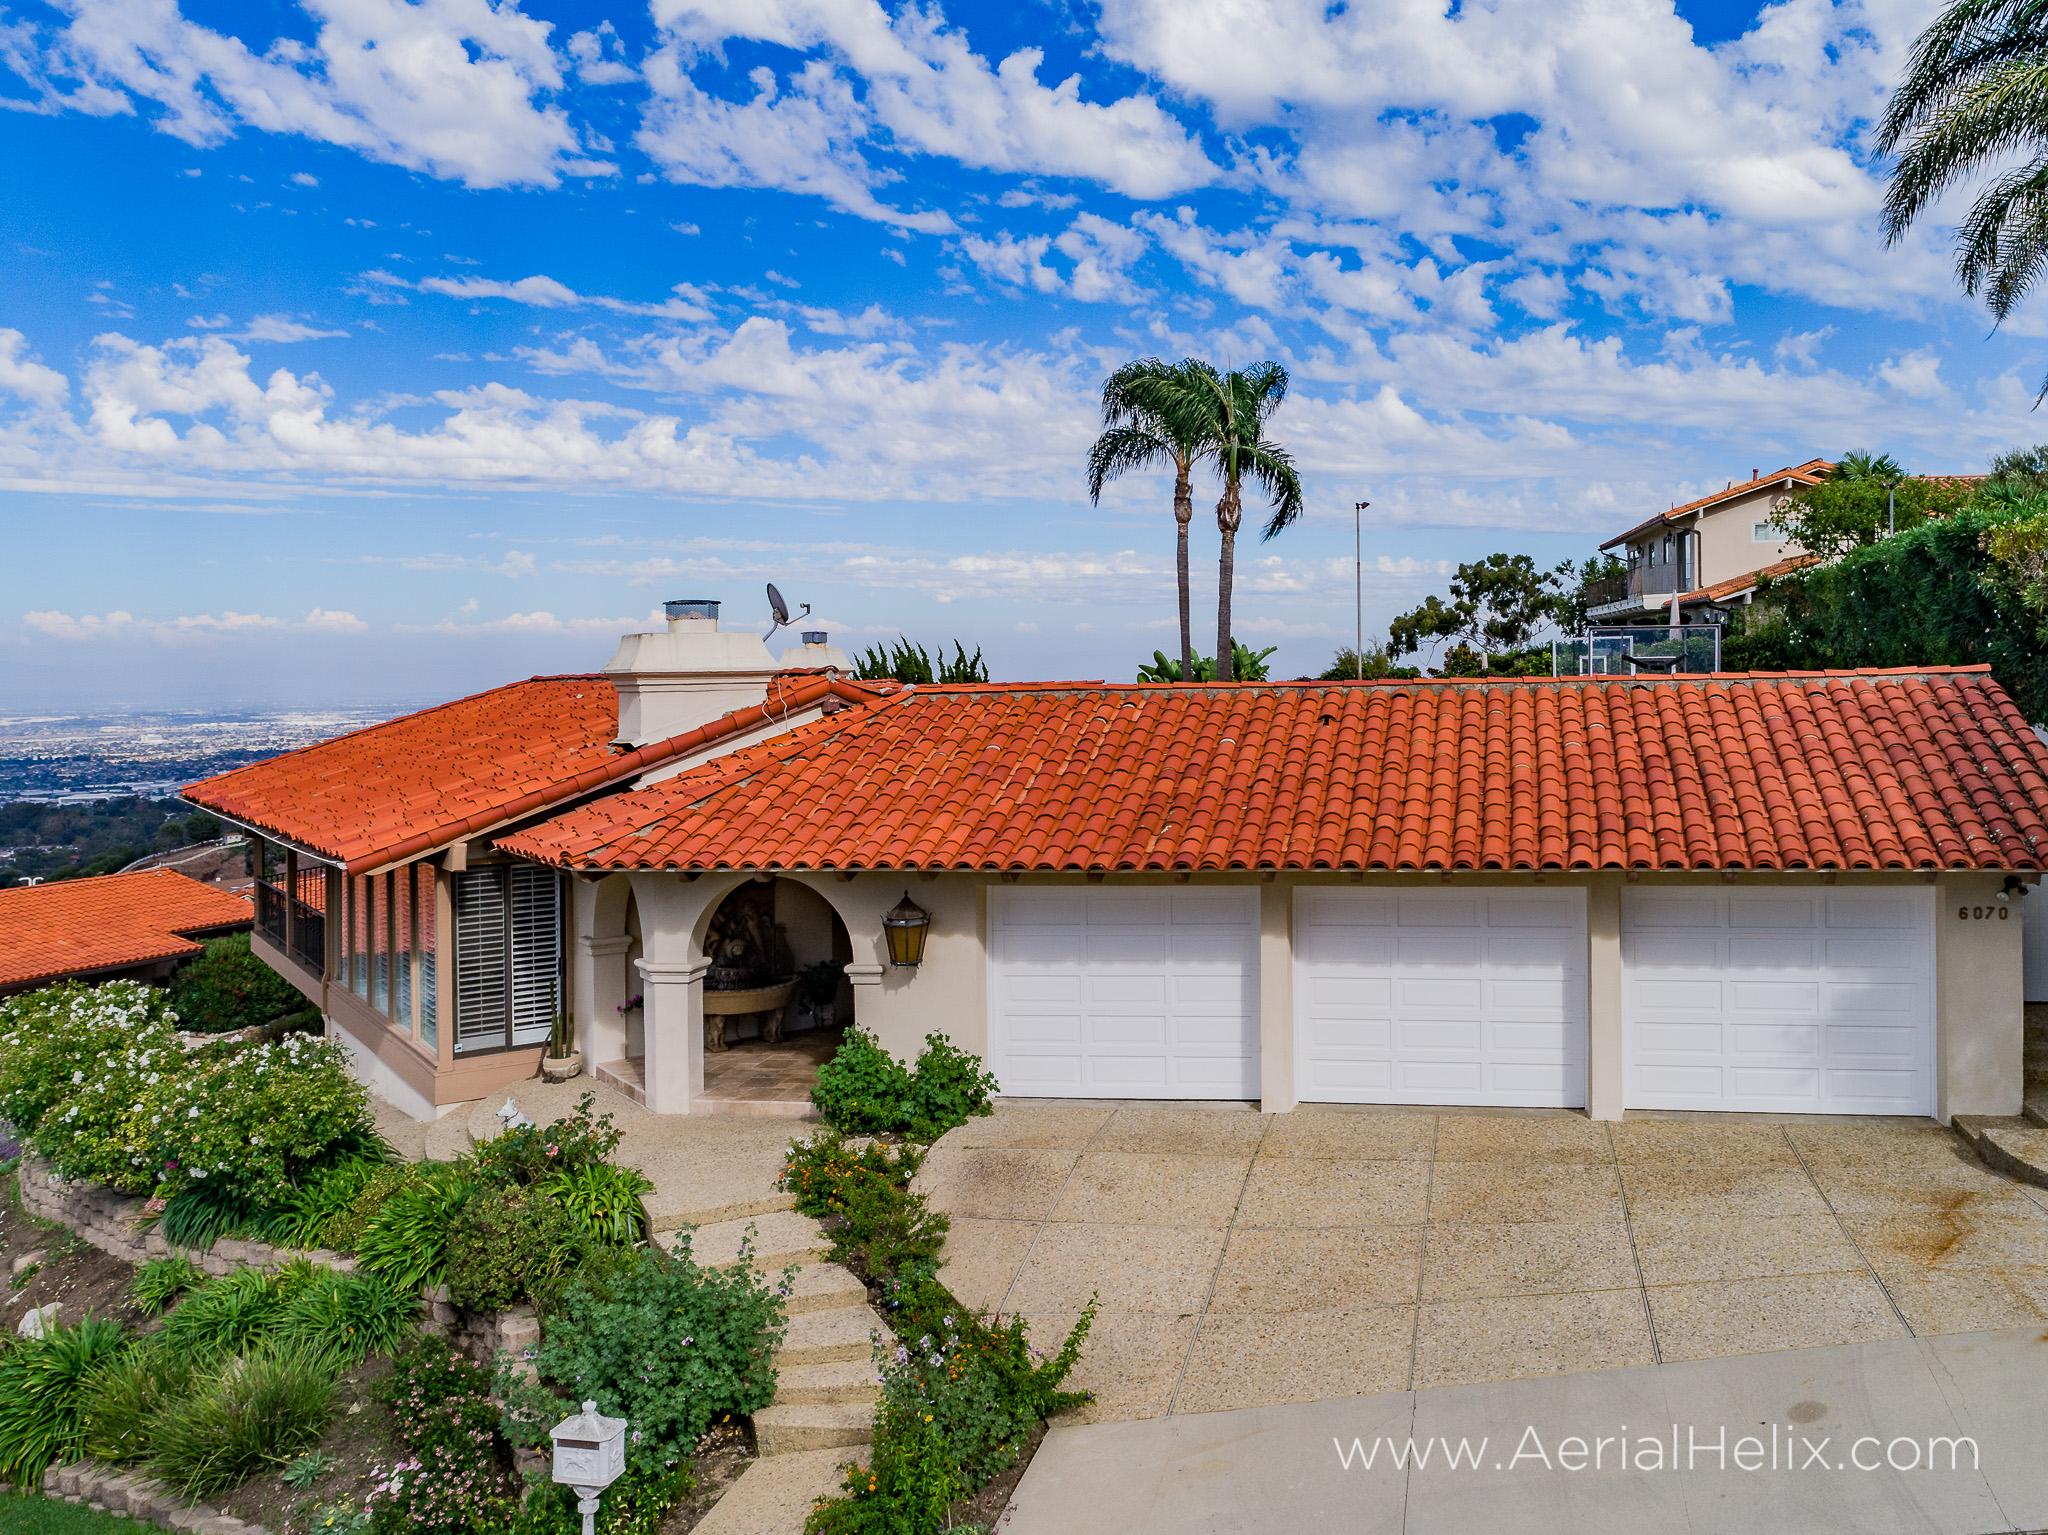 Woodfern Drive - HELIX Real Estate Aerial Photographer-7.jpg